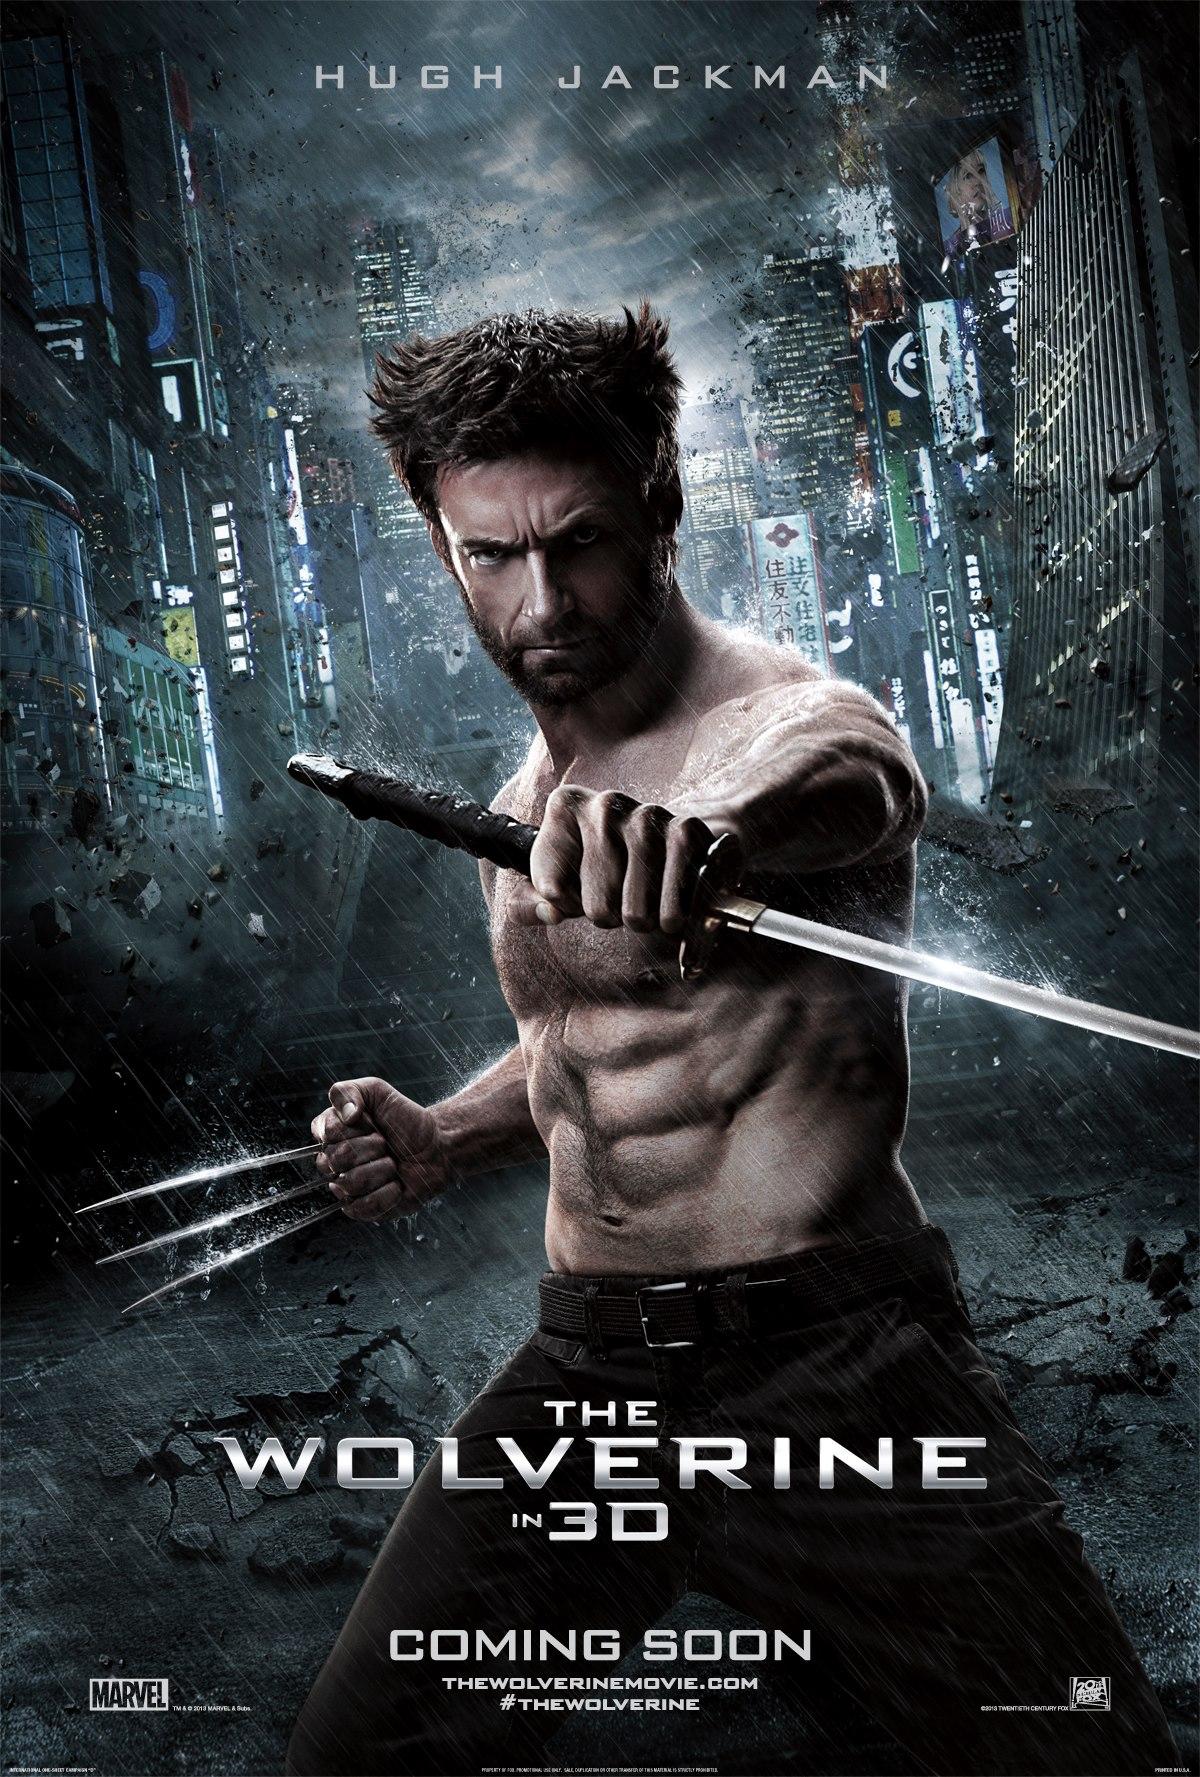 The Wolverine - Movie Poster #2 (Original)